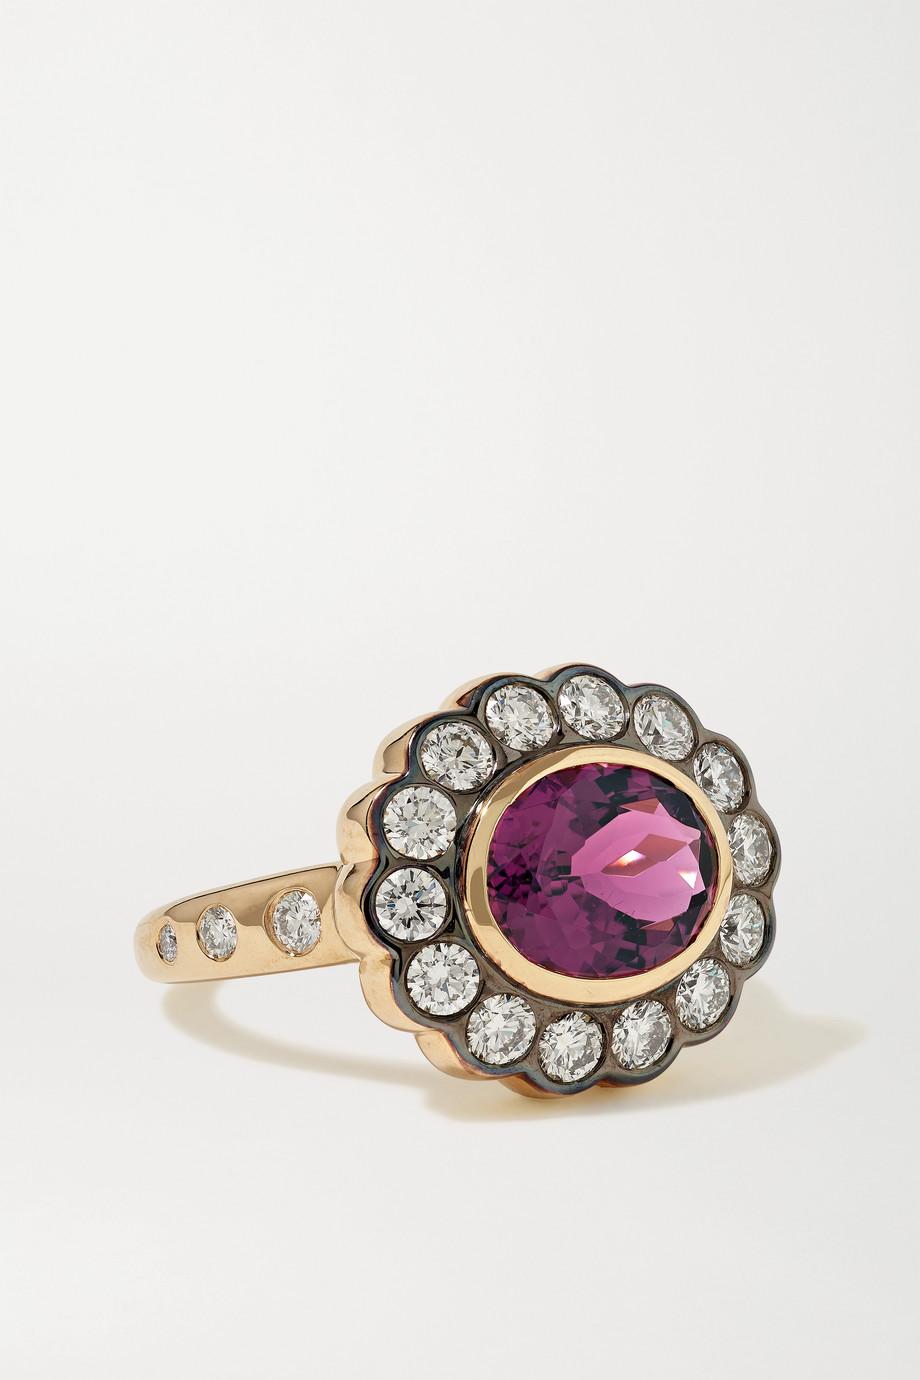 Marlo Laz Alexandra 14-karat gold, tourmaline and diamond ring